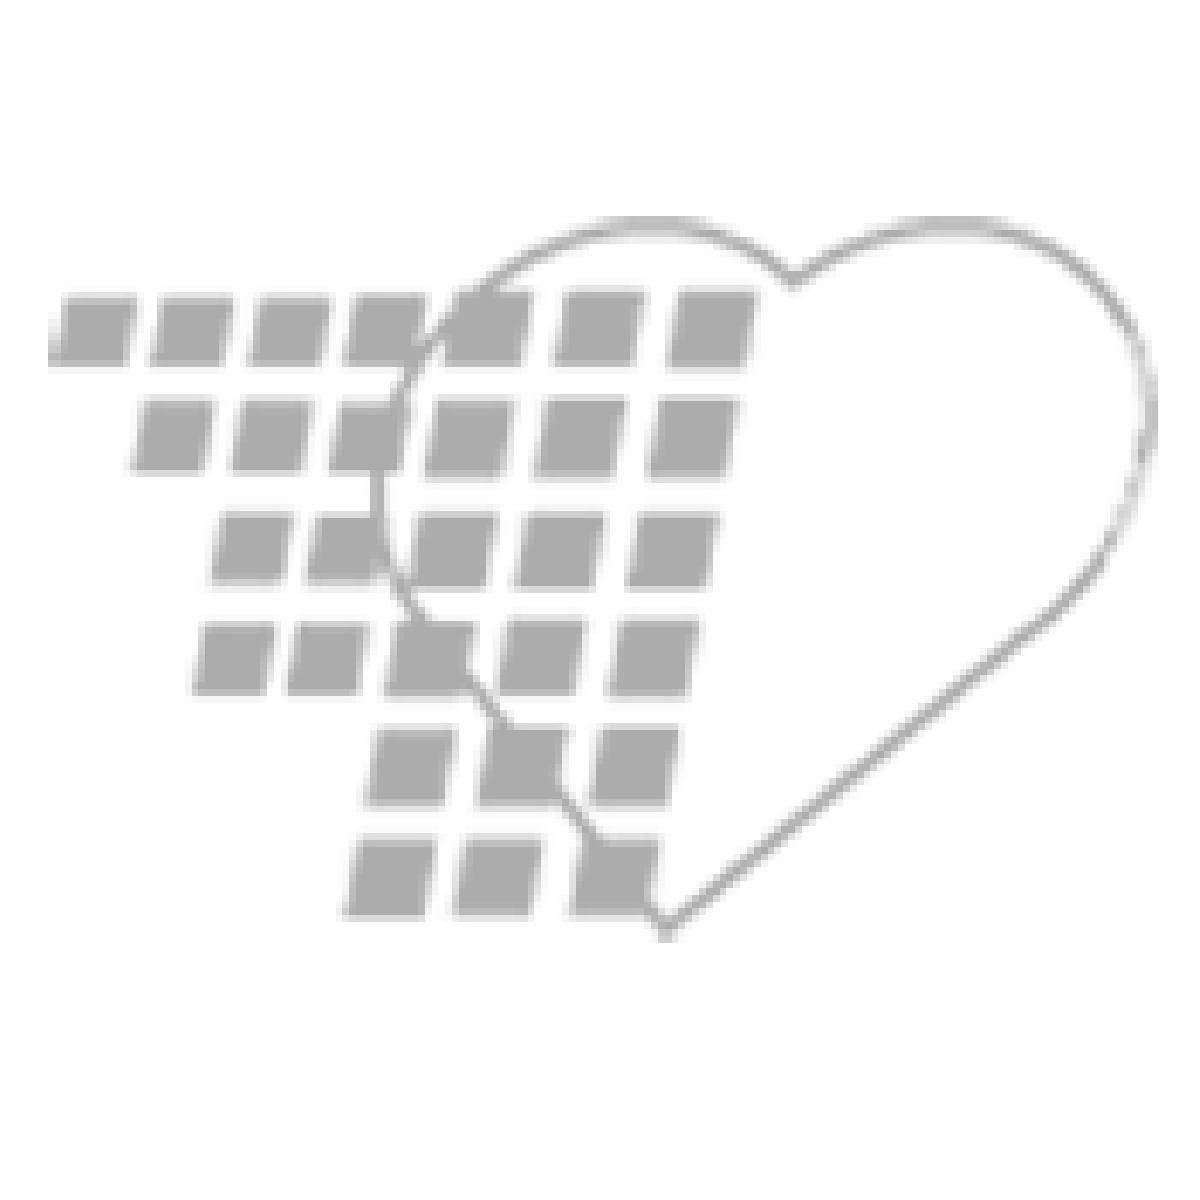 11-81-0962 Nasco Simulated Stool for the Life/form® Ostomy Care Simulator